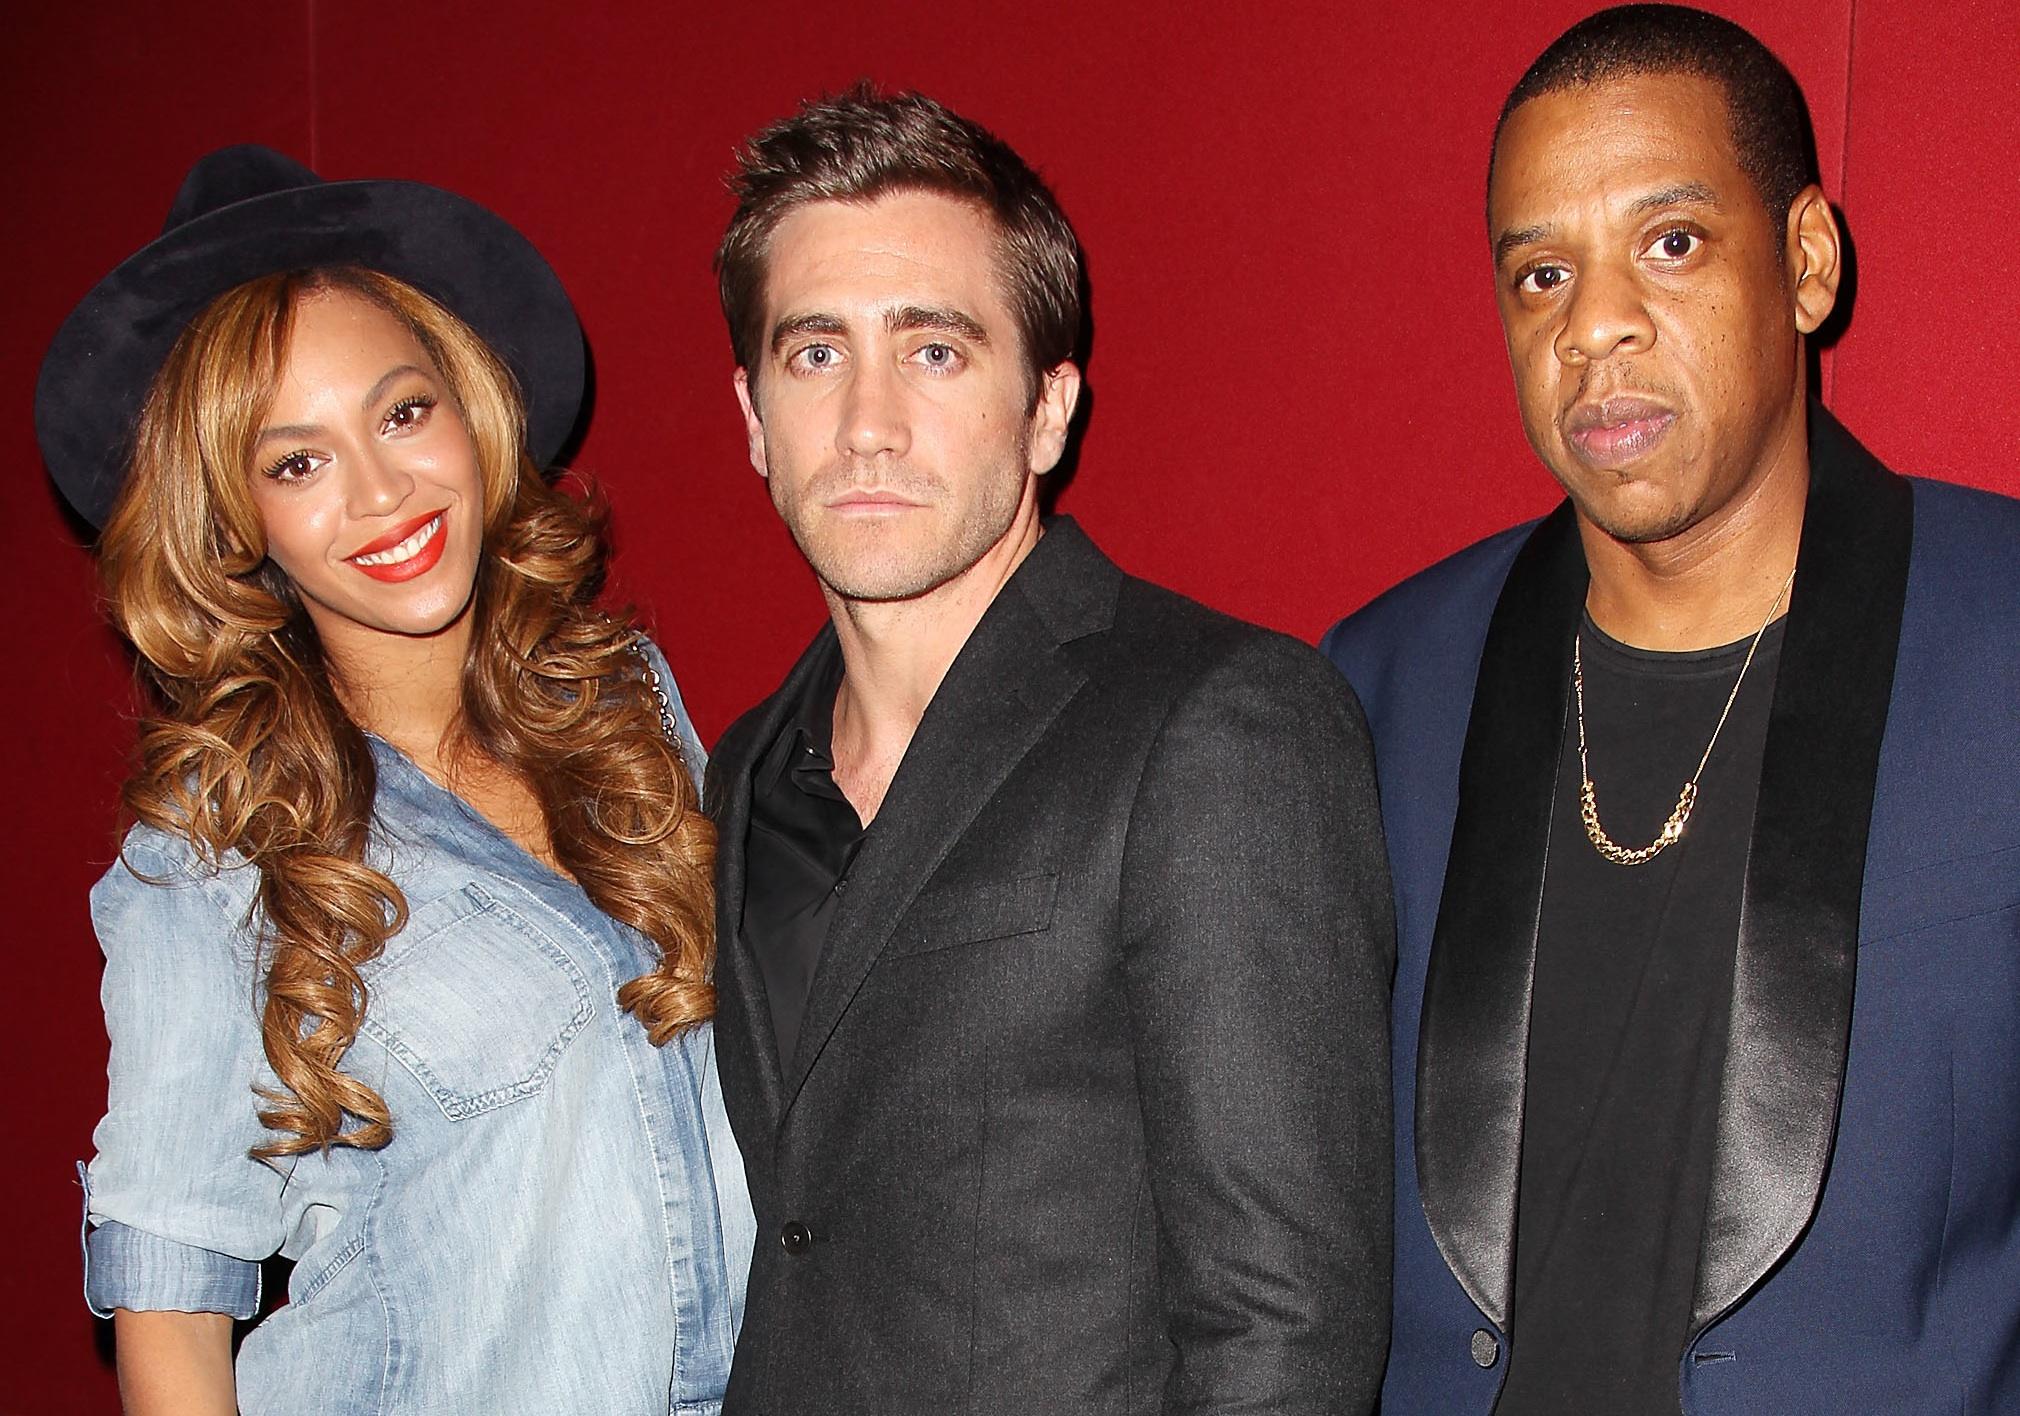 Jake Gyllenhaal, Beyonce, Jay-Z, 50 Cent Film Premiere News